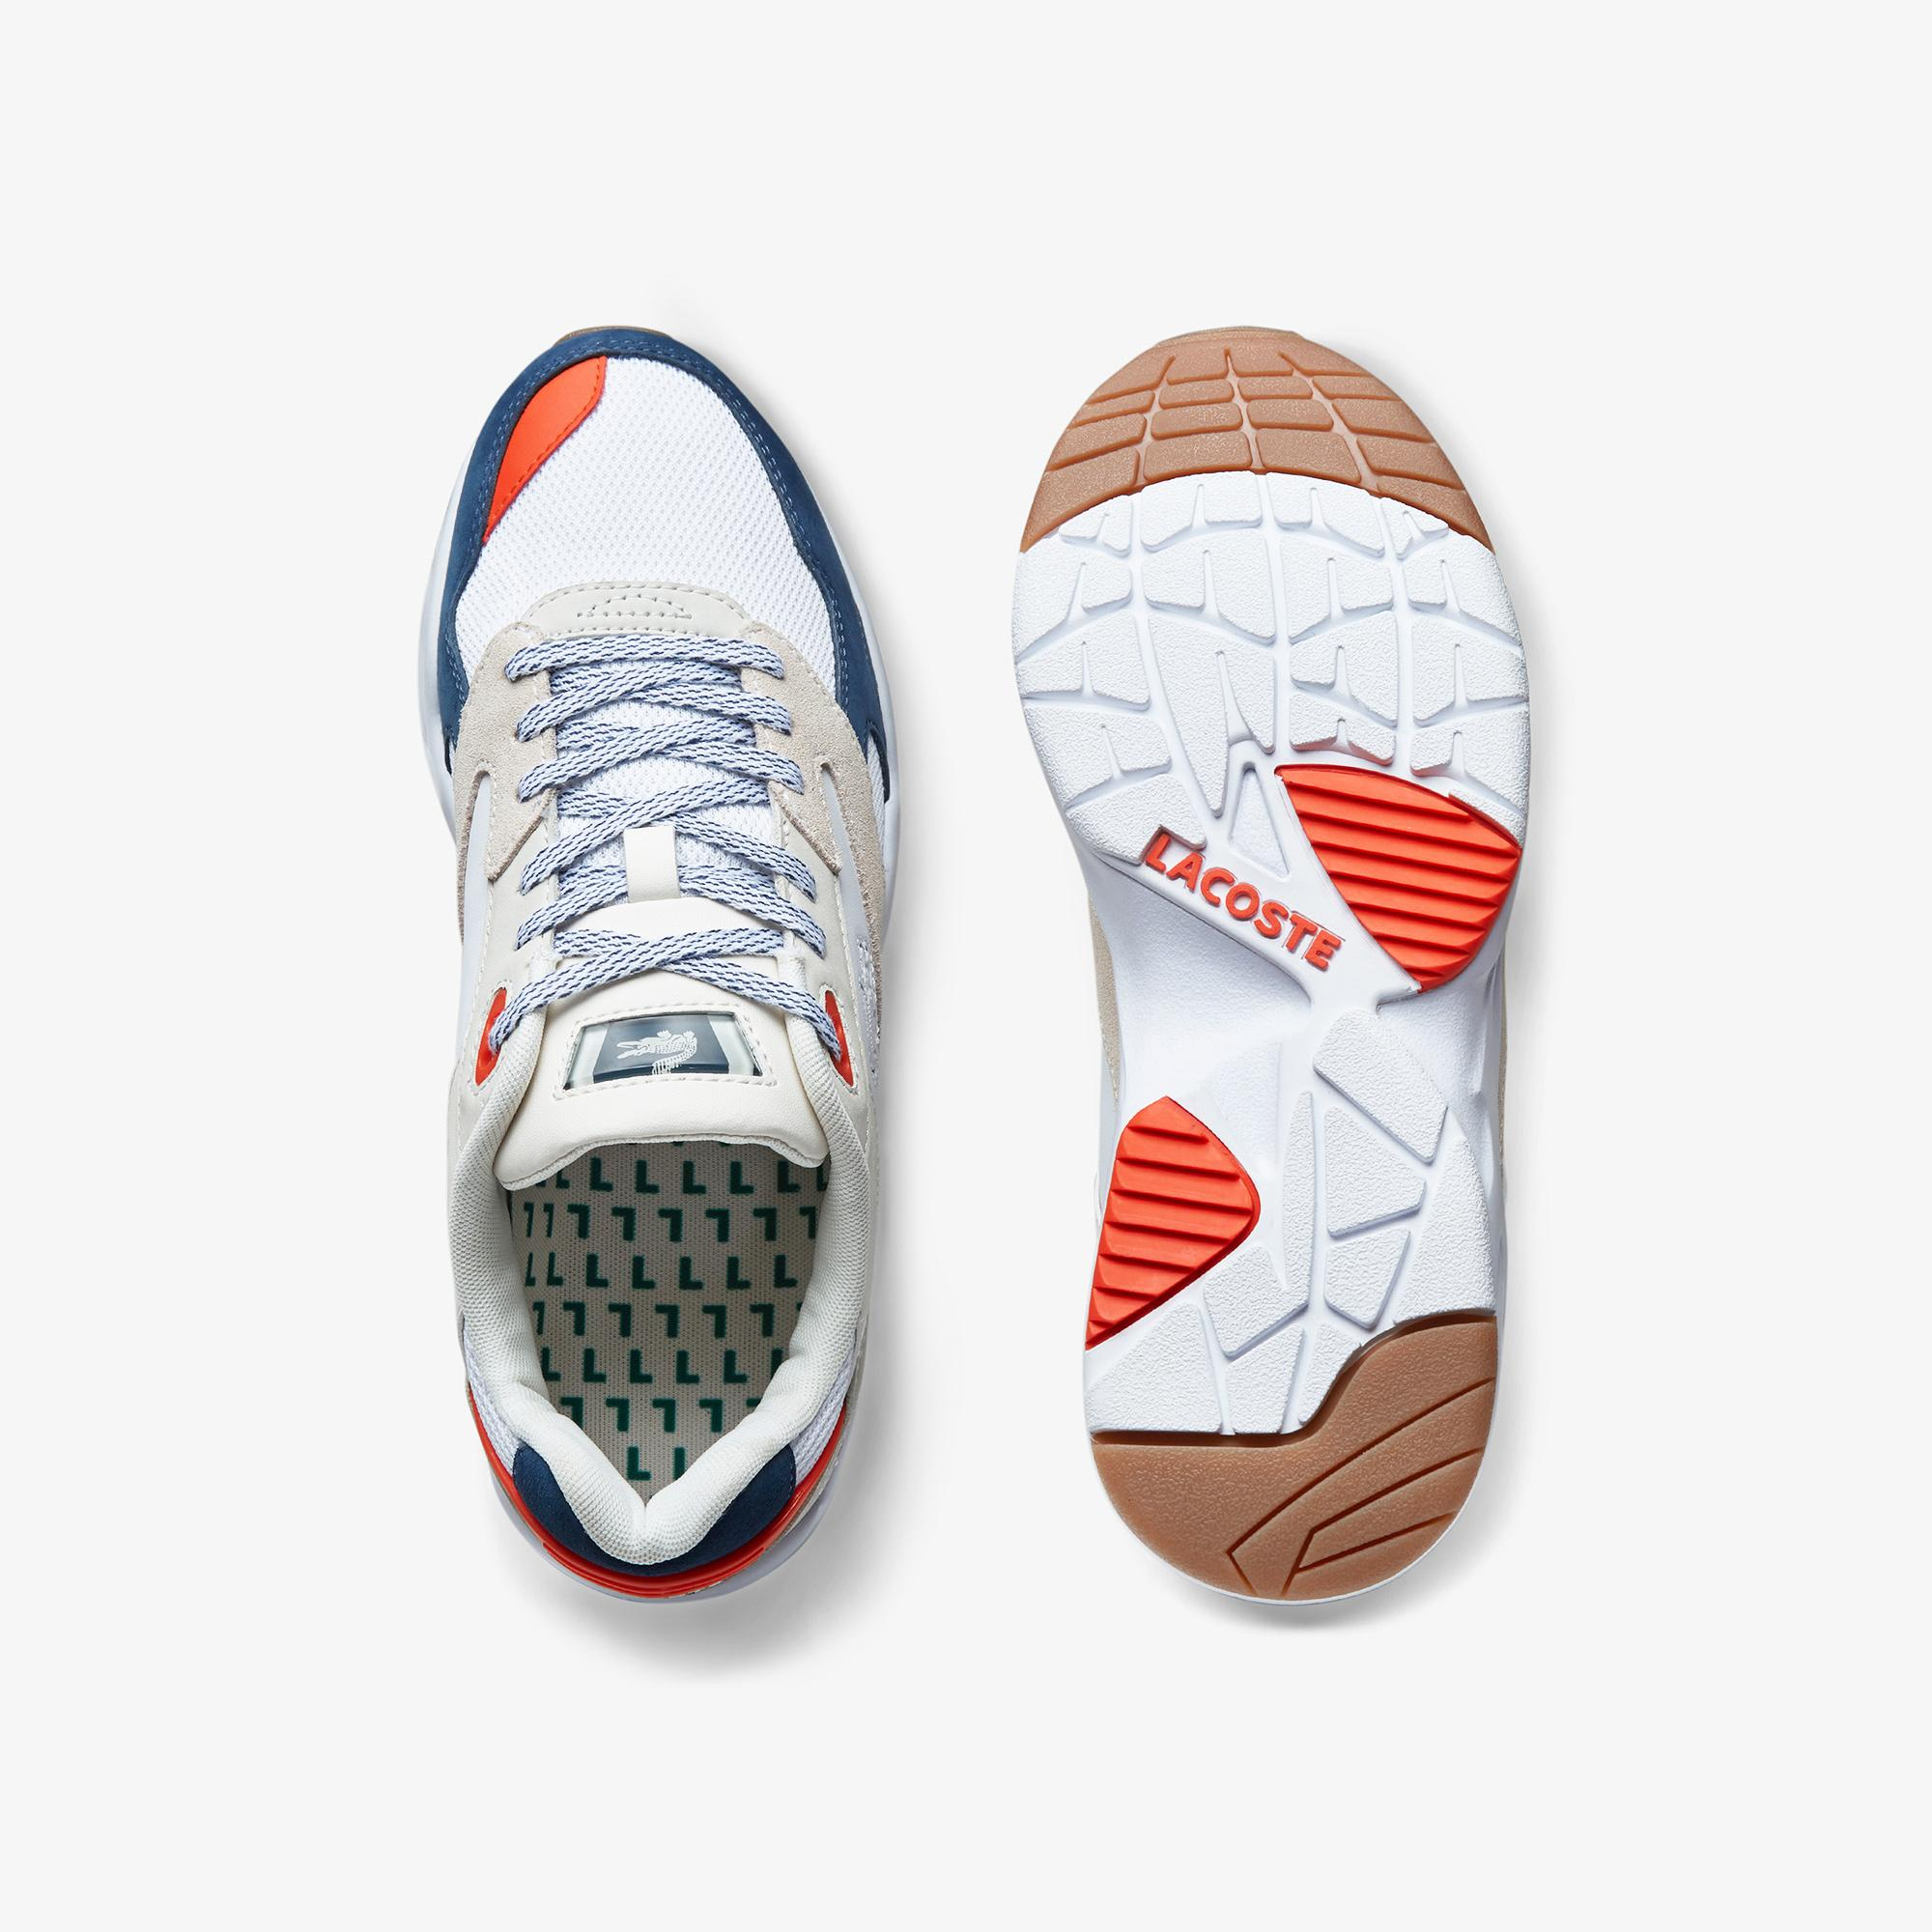 Lacoste Storm 96 Lo 0120 4 Sma Męskie Sneakersy